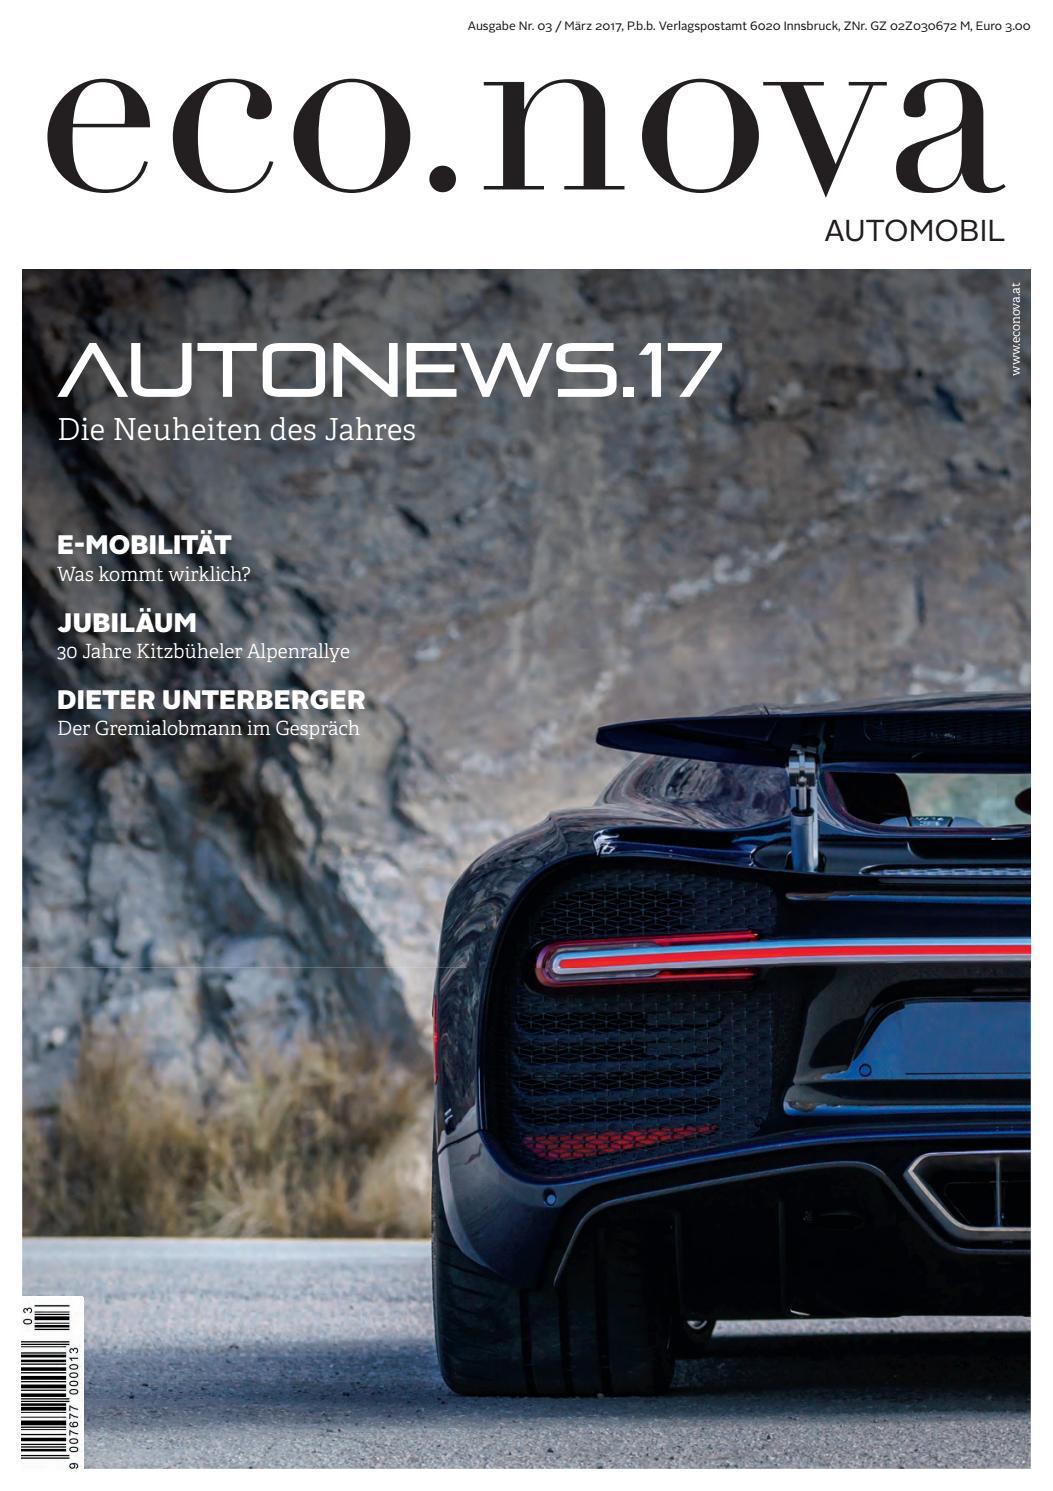 eco.nova SPEZIAL Automobil 2017 by eco.nova verlags gmbh - issuu